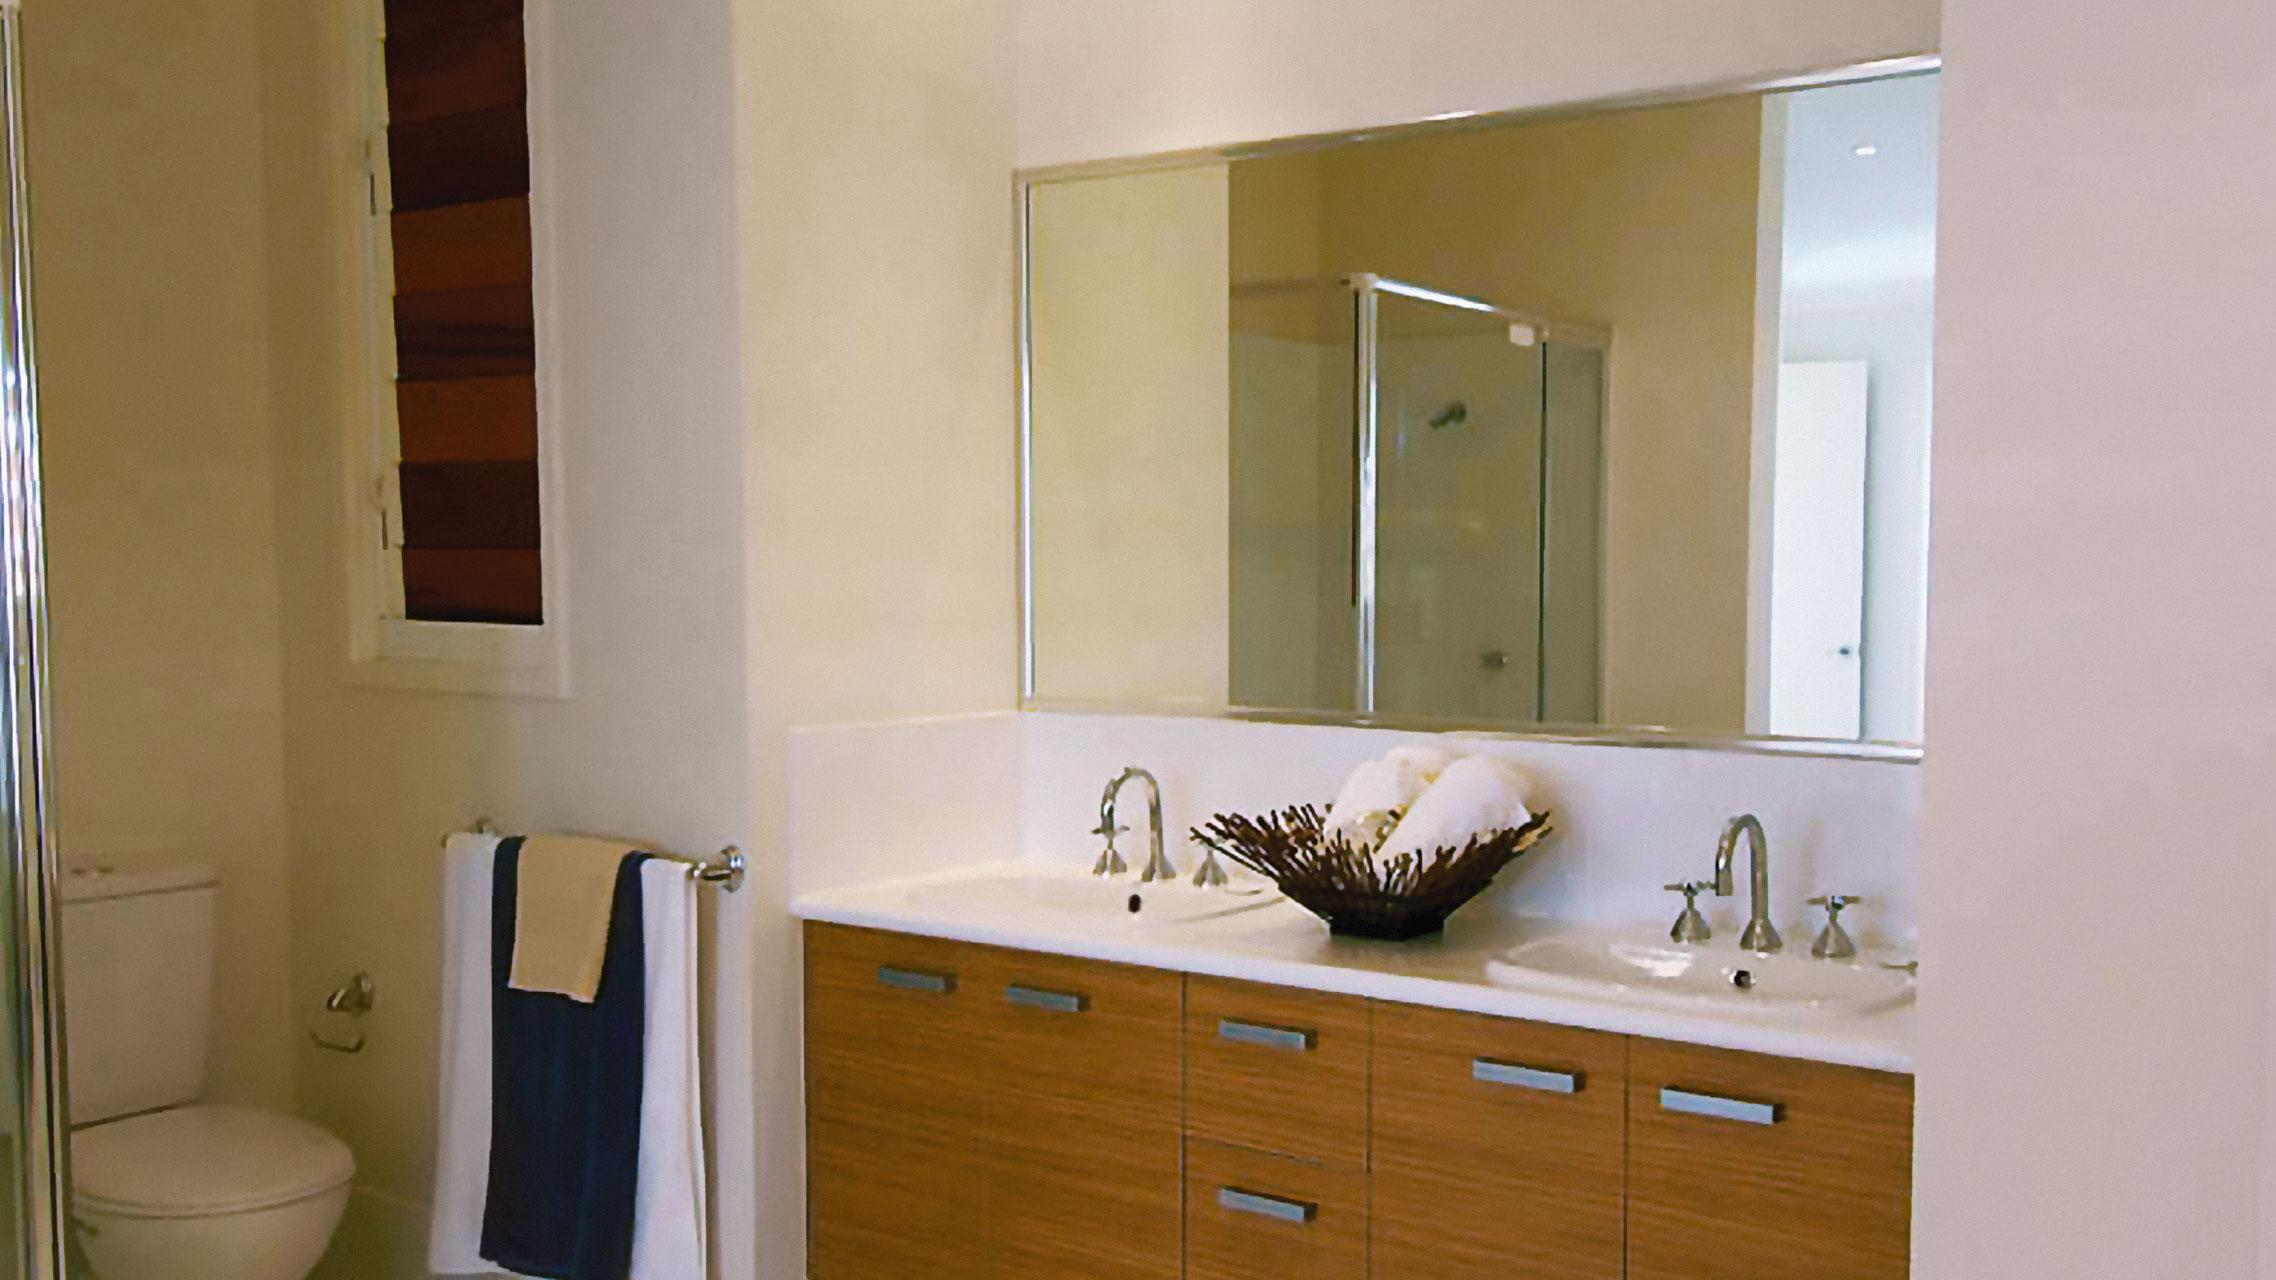 Bathroom Mirror with Polished Silver frame